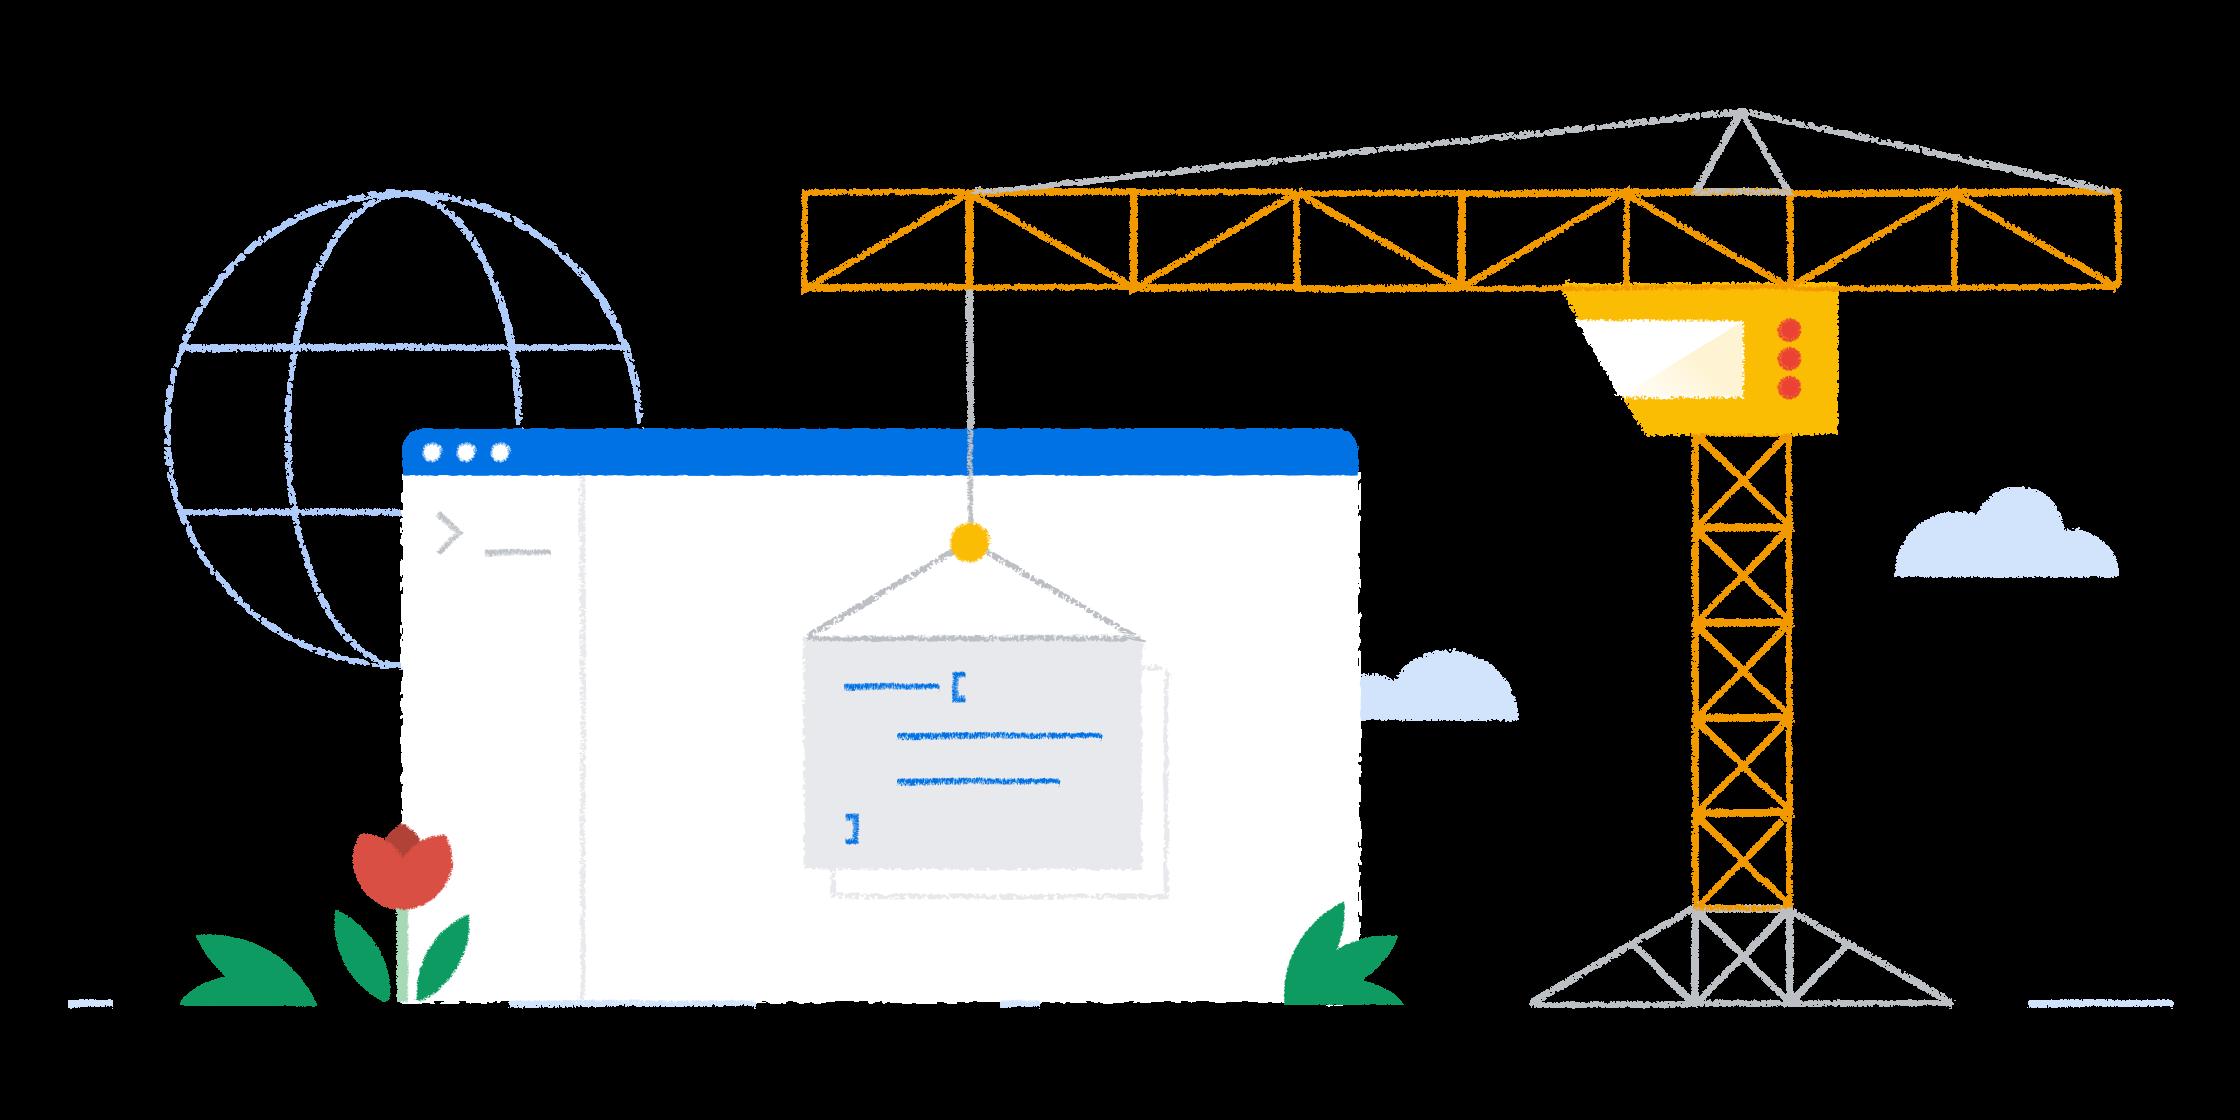 Construction crane lifting a resource into a Chrome tab